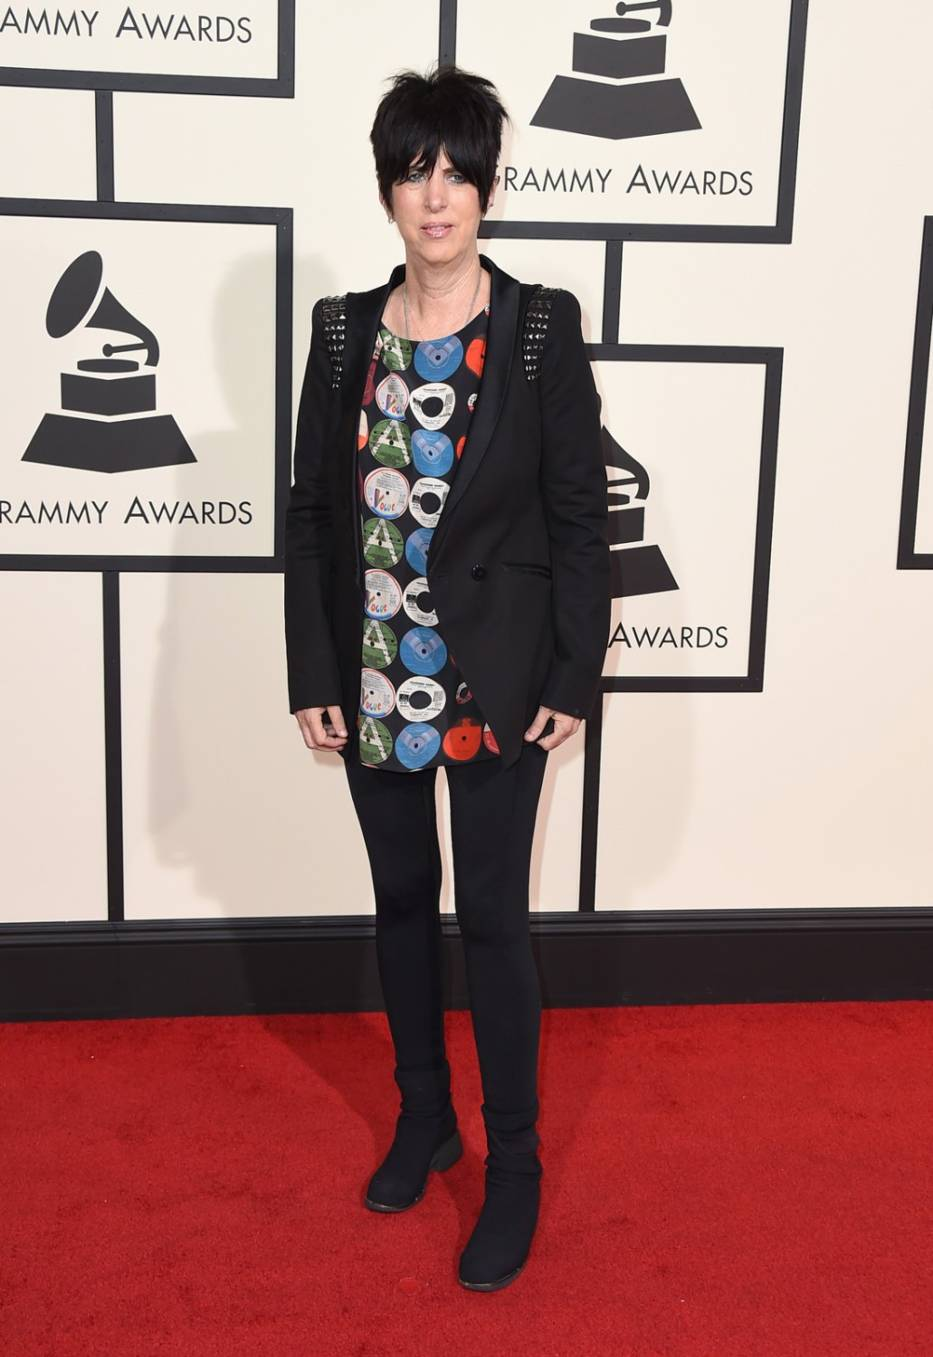 Grammy rozdane! Triumf Taylor Swif i hołd Gagi dla Bowiego